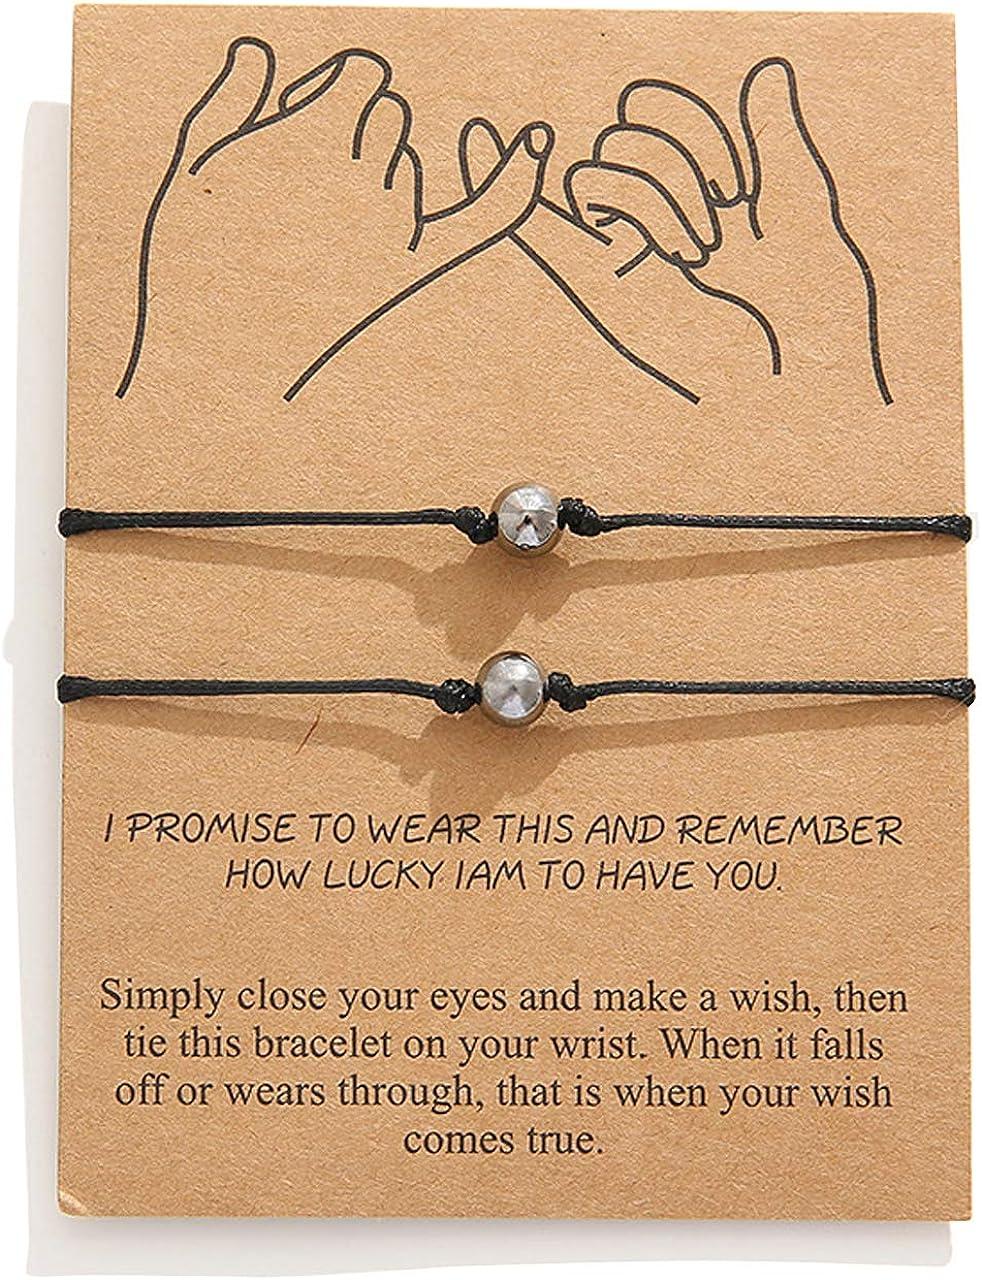 EZIO Long Distance Bracelets for Couples Friendship Best Friend Bracelets for 2,Boyfriend Girlfriend Relationship Bracelet Pinky Promise Matching Adjustable Ankle Bracelet for Women Men